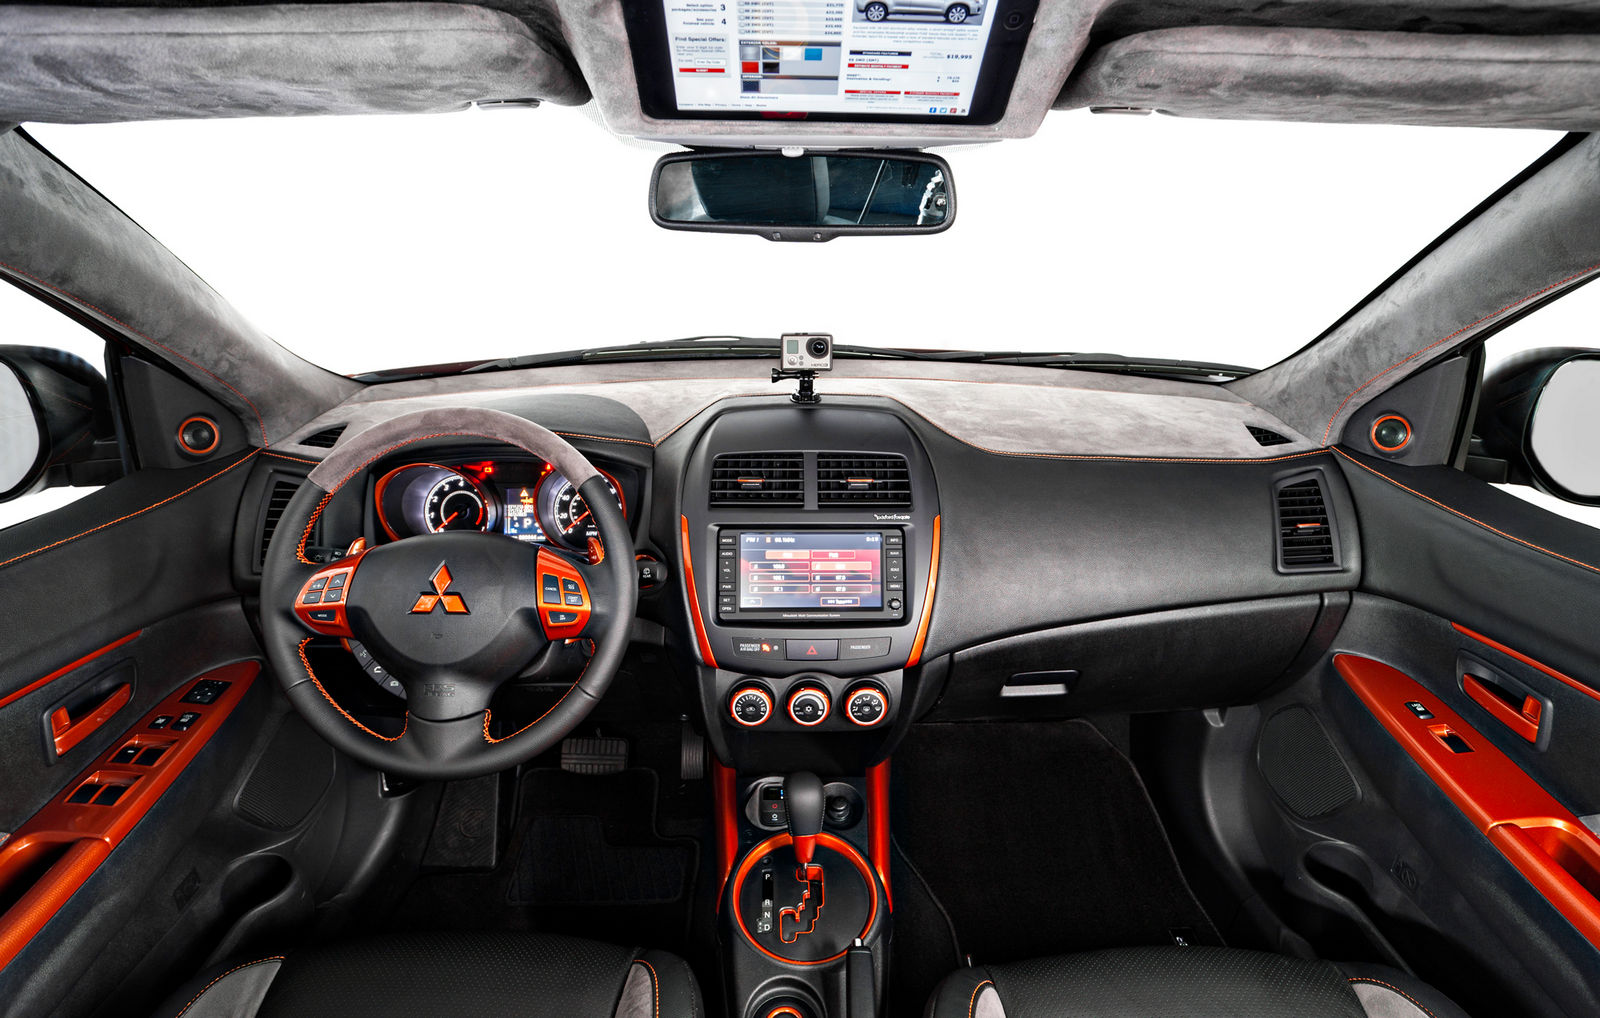 mitsubishi outlander sport summer edition interiorjpg 16001018 pixels mitsubishi outlander sport pinterest mitsubishi outlander cars and evo